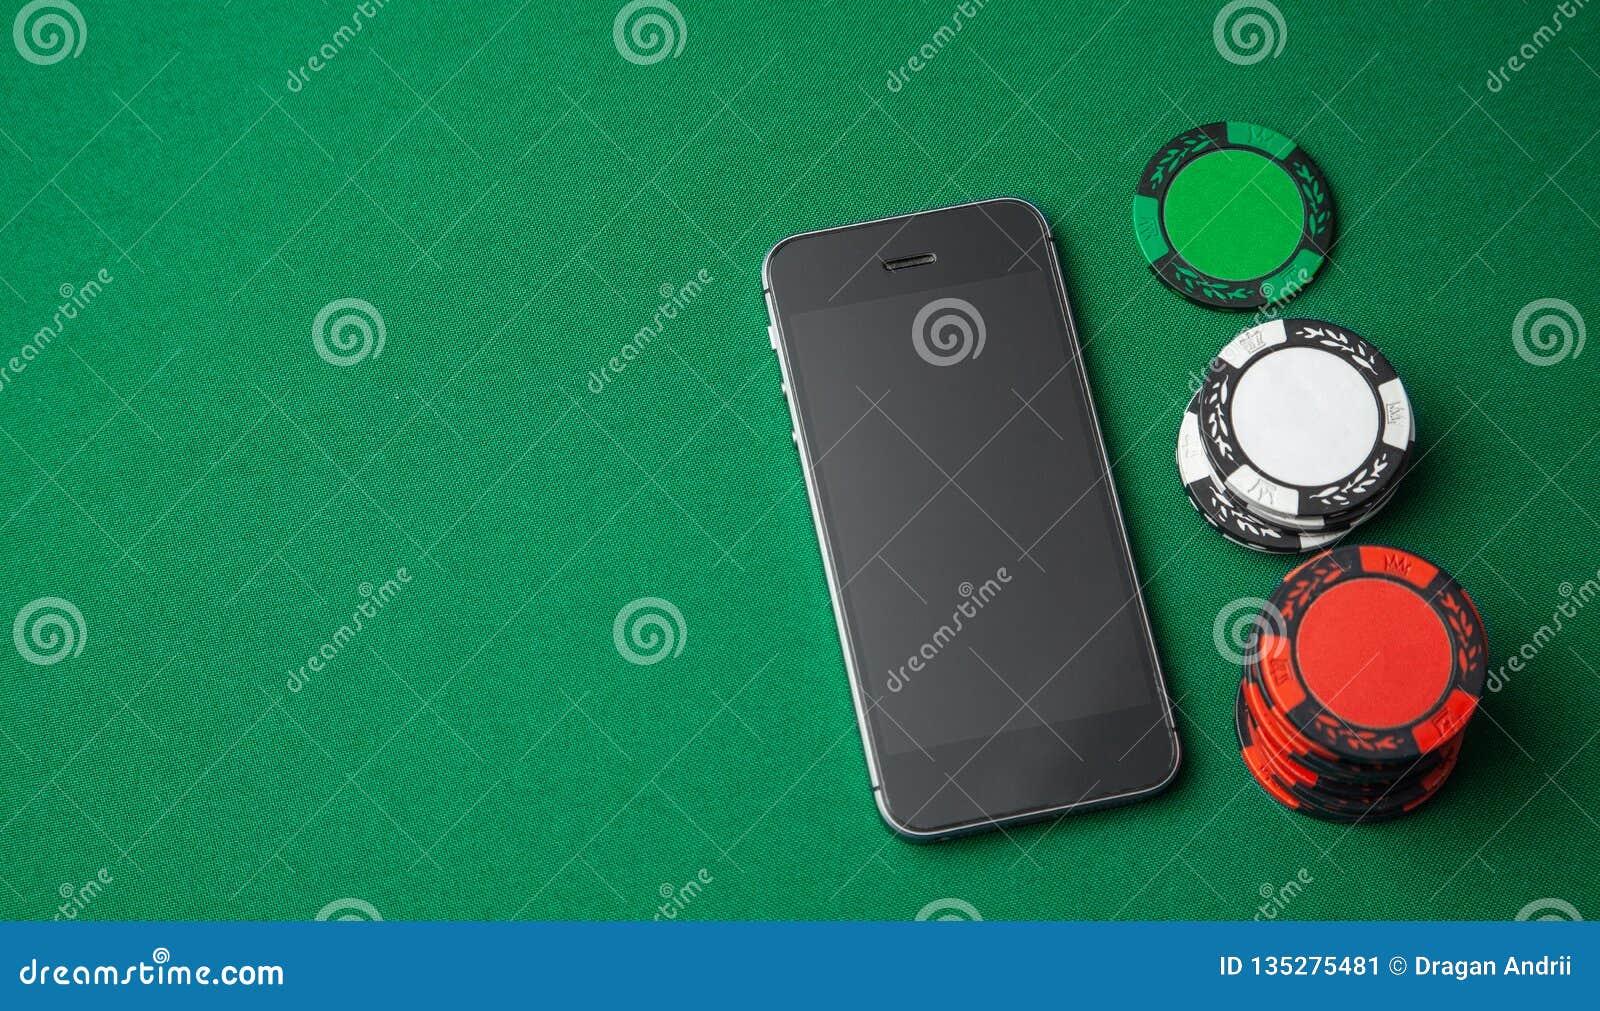 The money game игровые автоматы